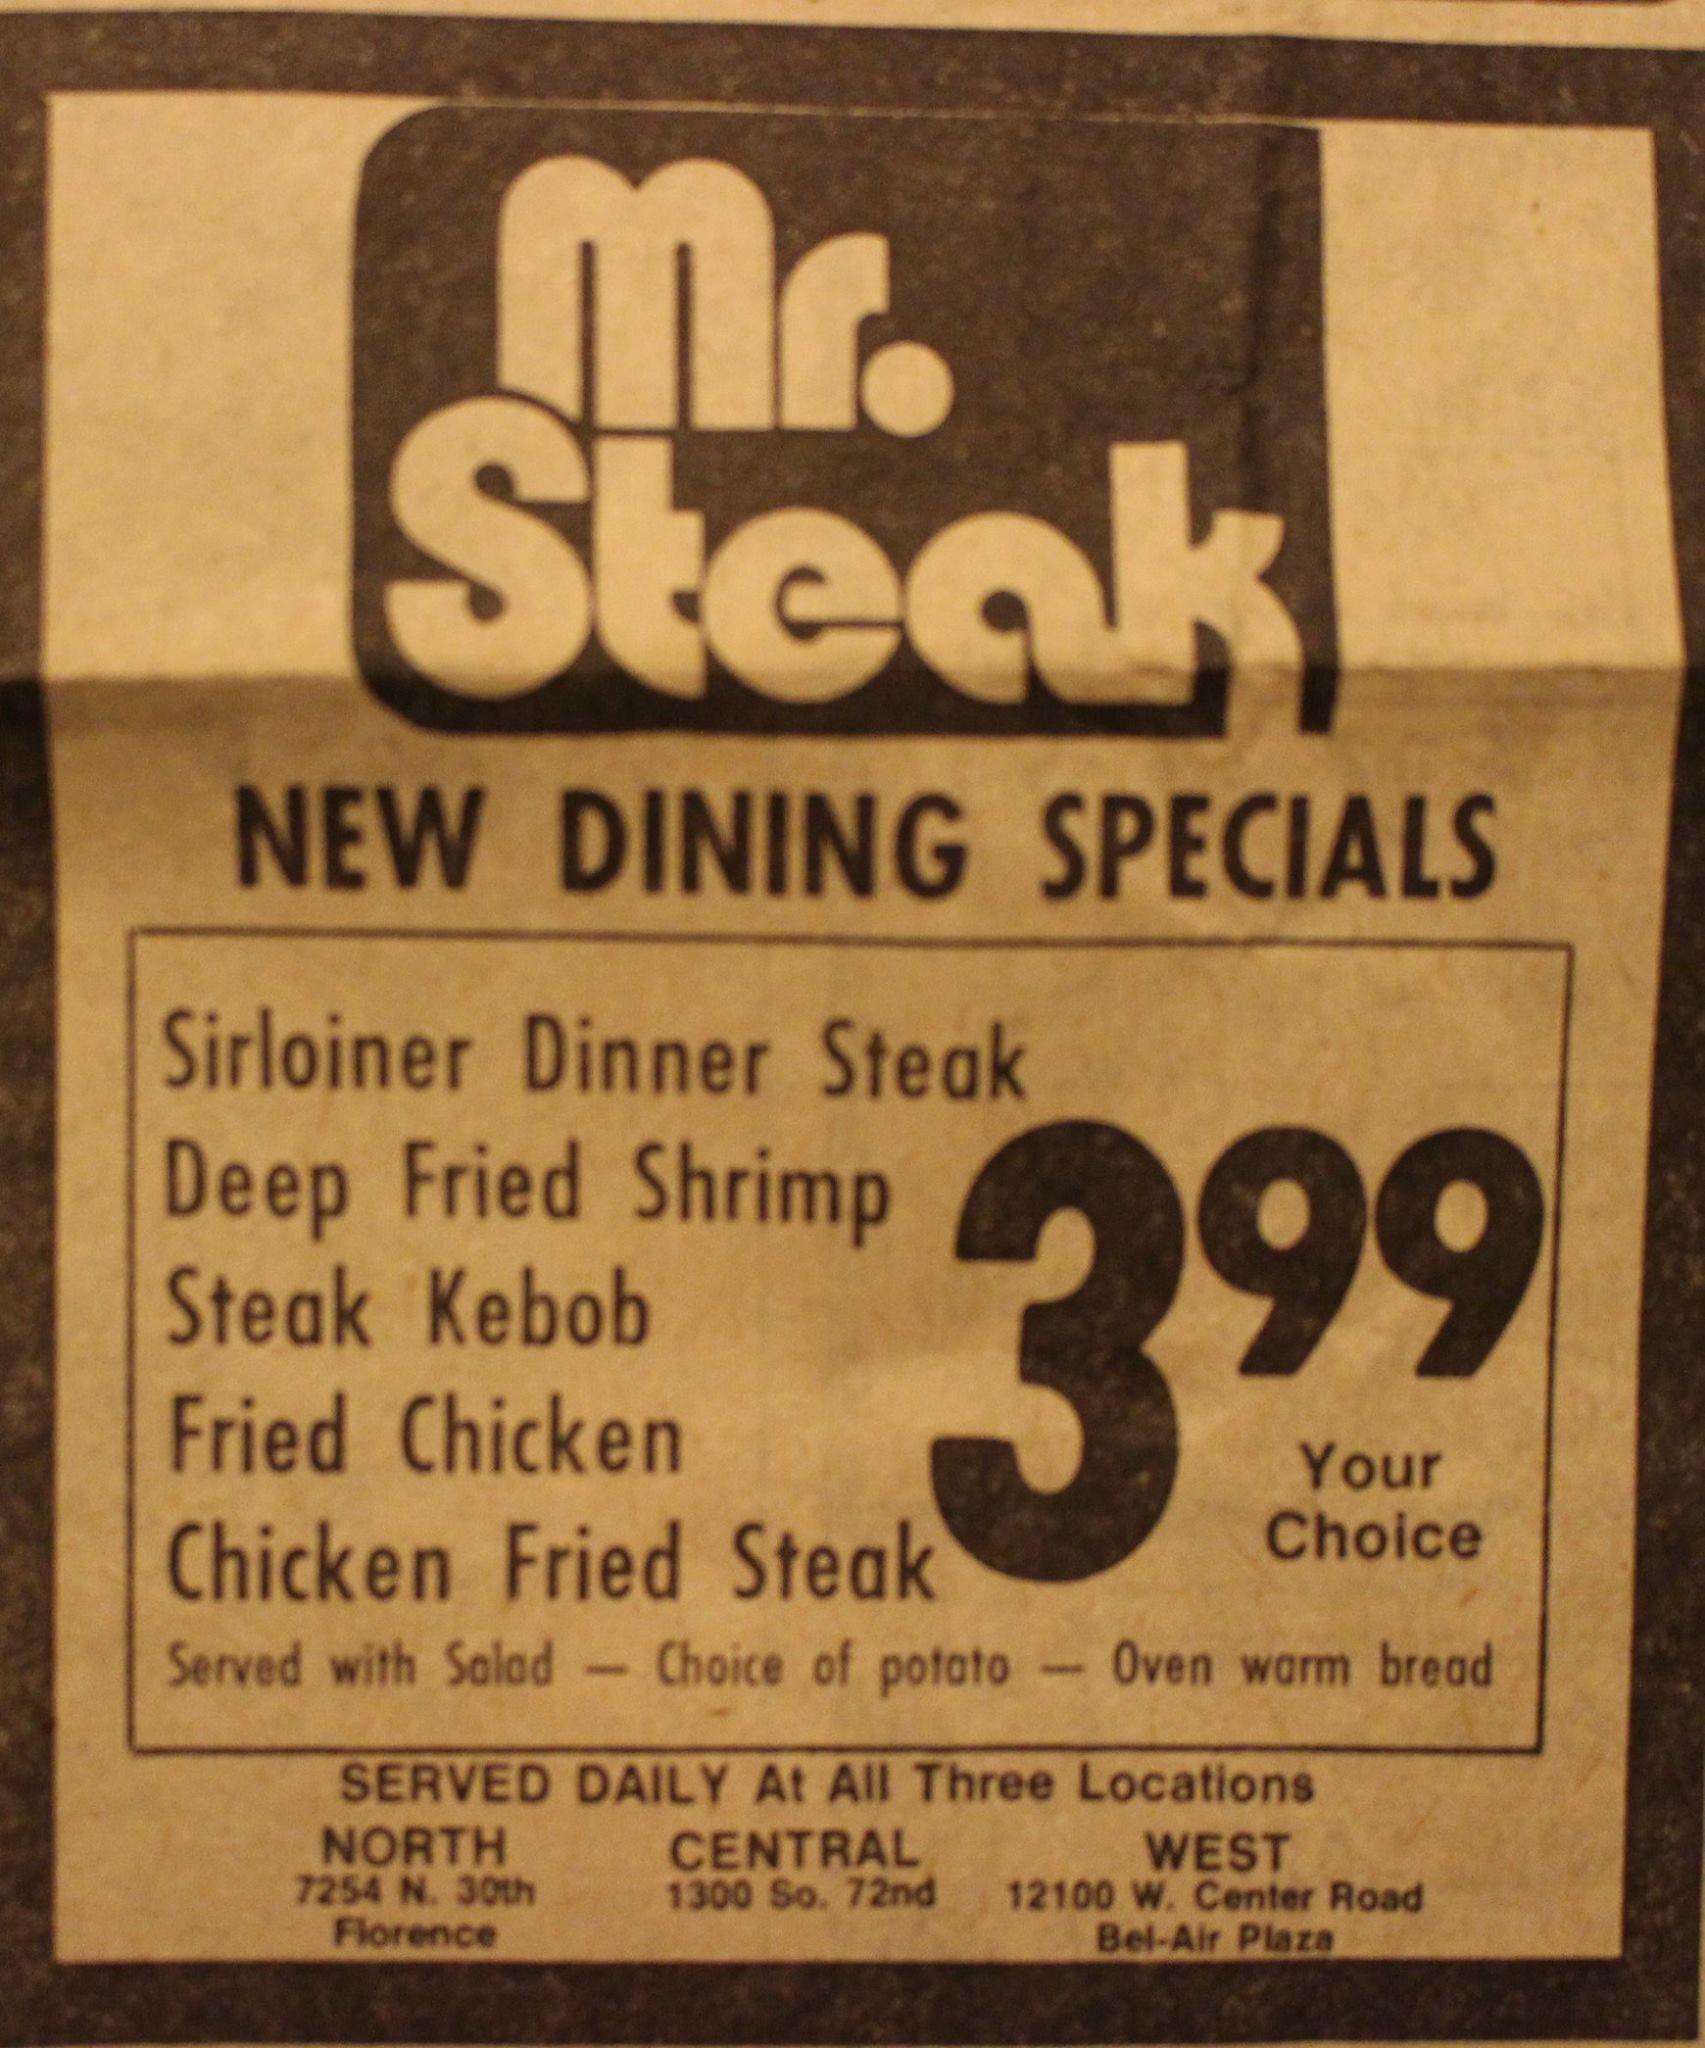 Mr. Steak, 7254 North 30th Street, North Omaha, Nebraska